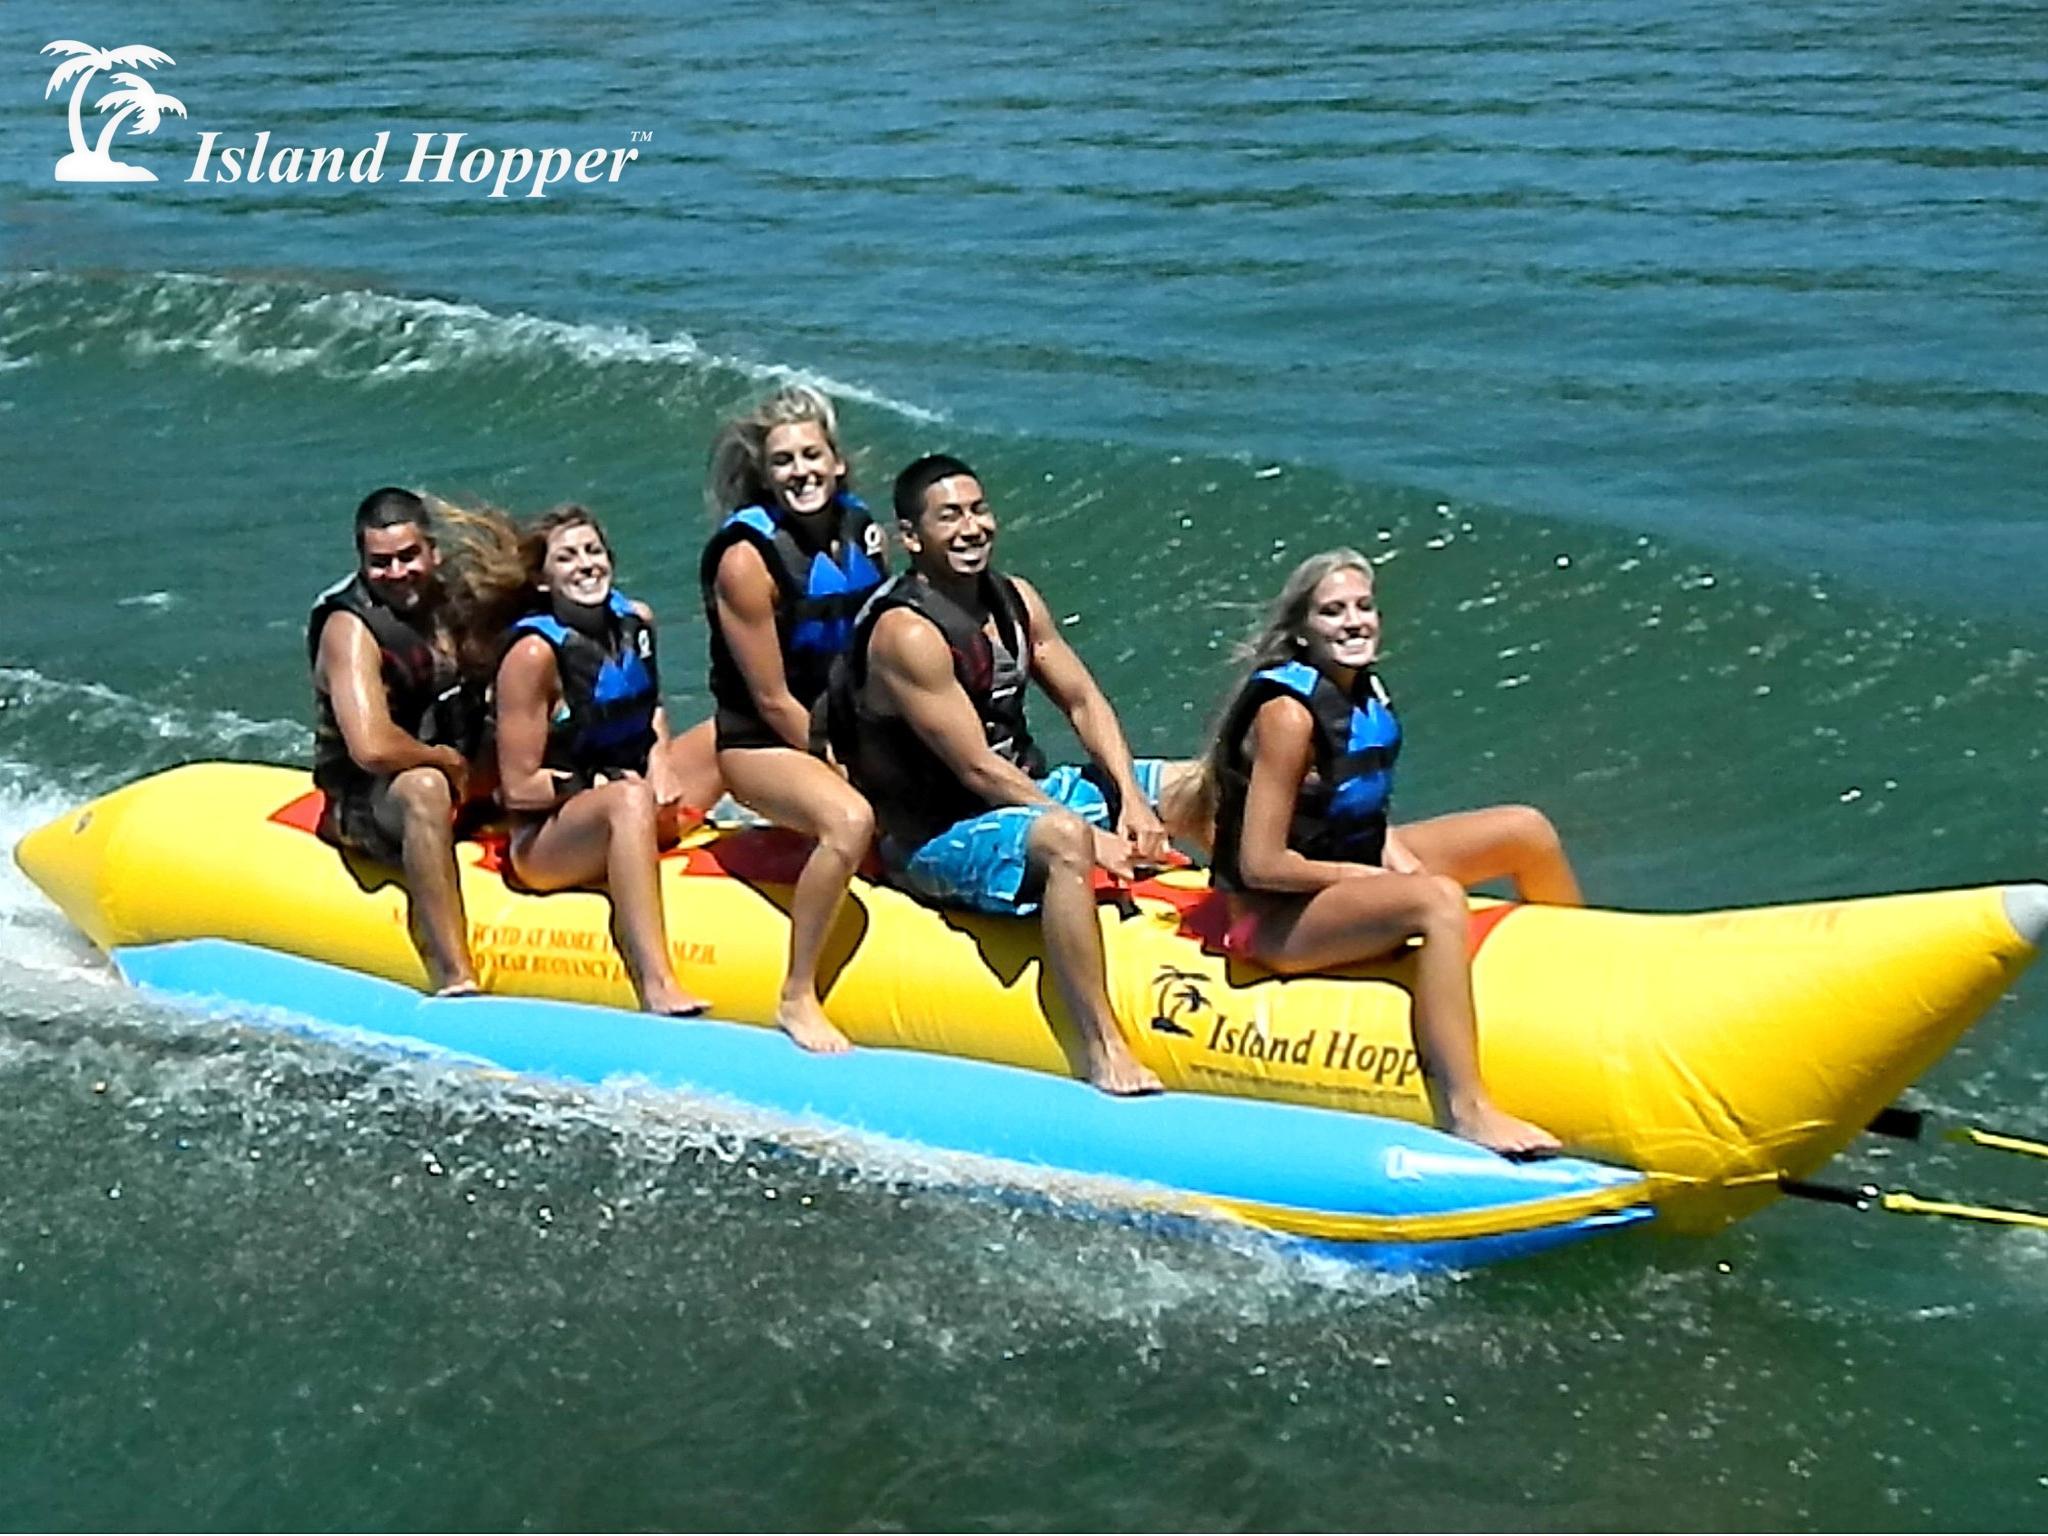 Aqua Sports 420-5 5 Passenger 17 Feet In-line Seats Island Hopper Recreational Banana Water Sled